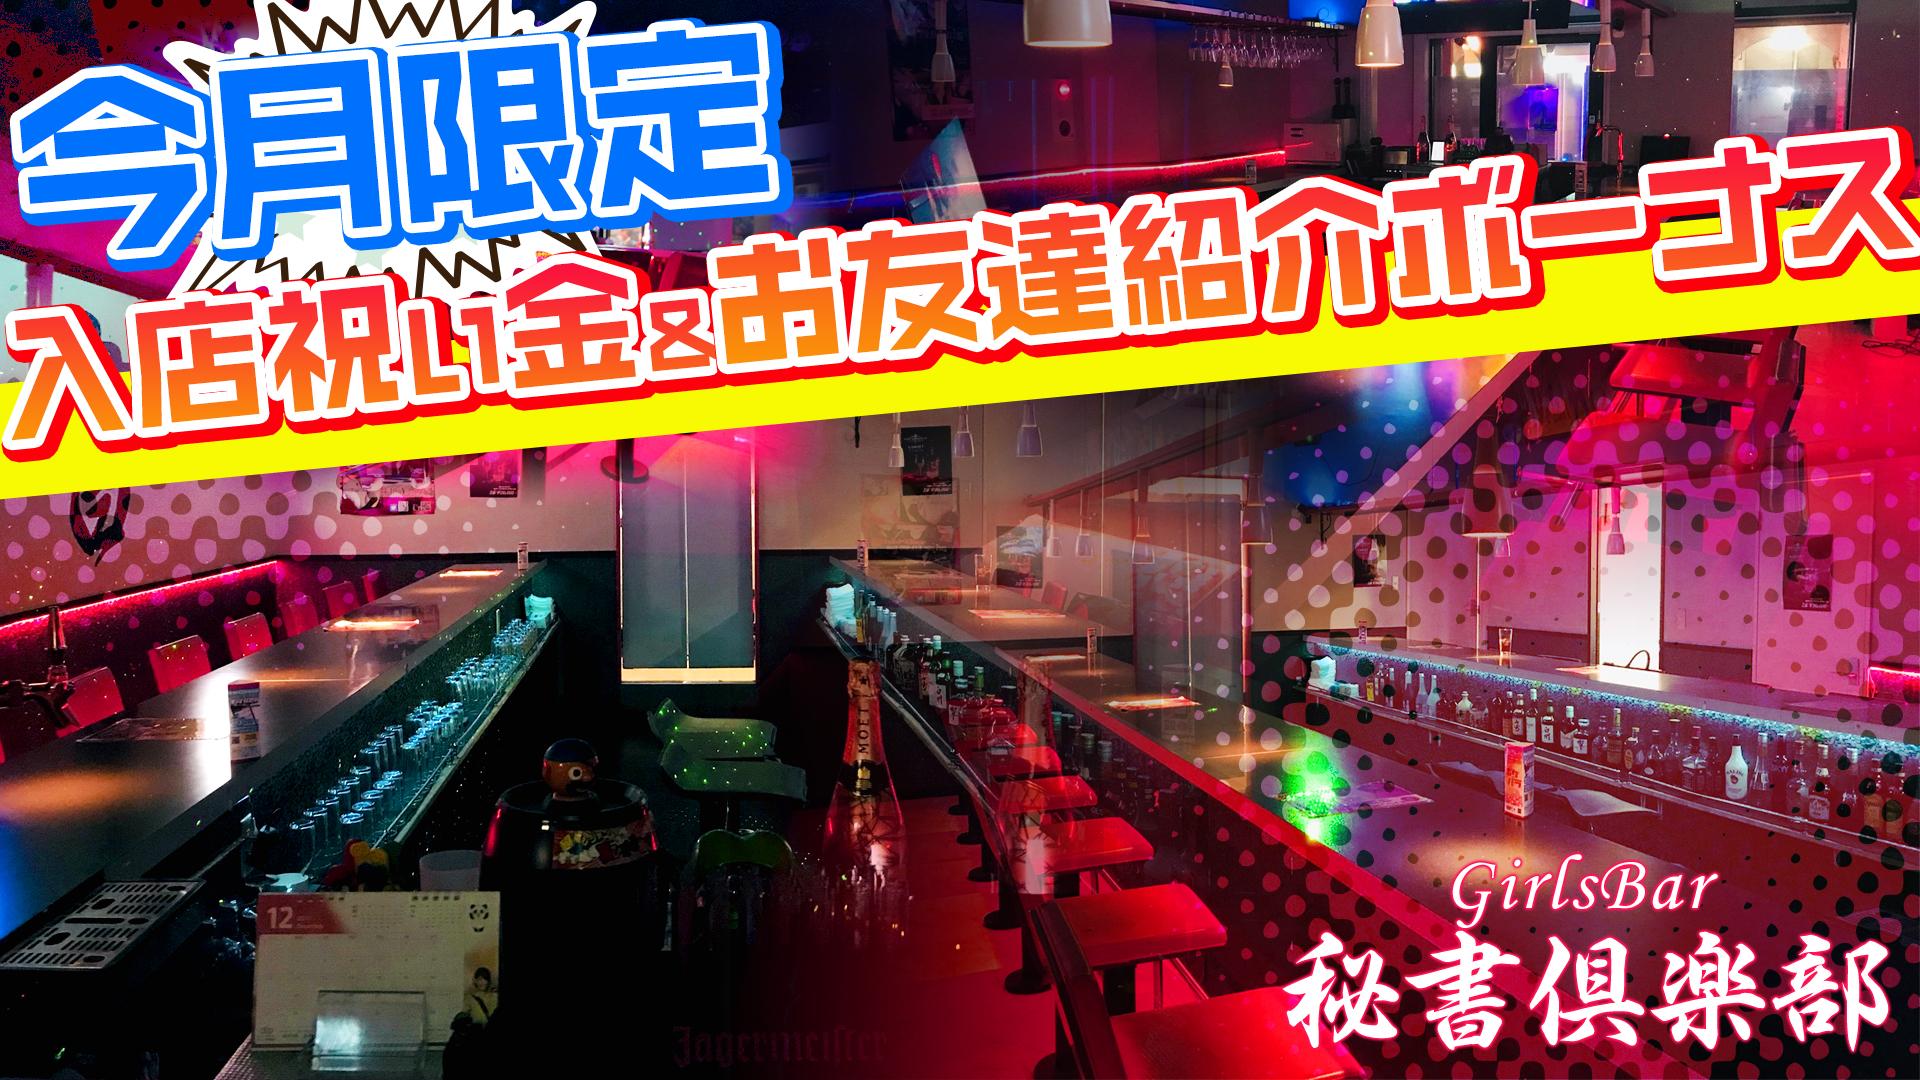 Girl's Bar 秘書倶楽部 五反田 ガールズバー TOP画像